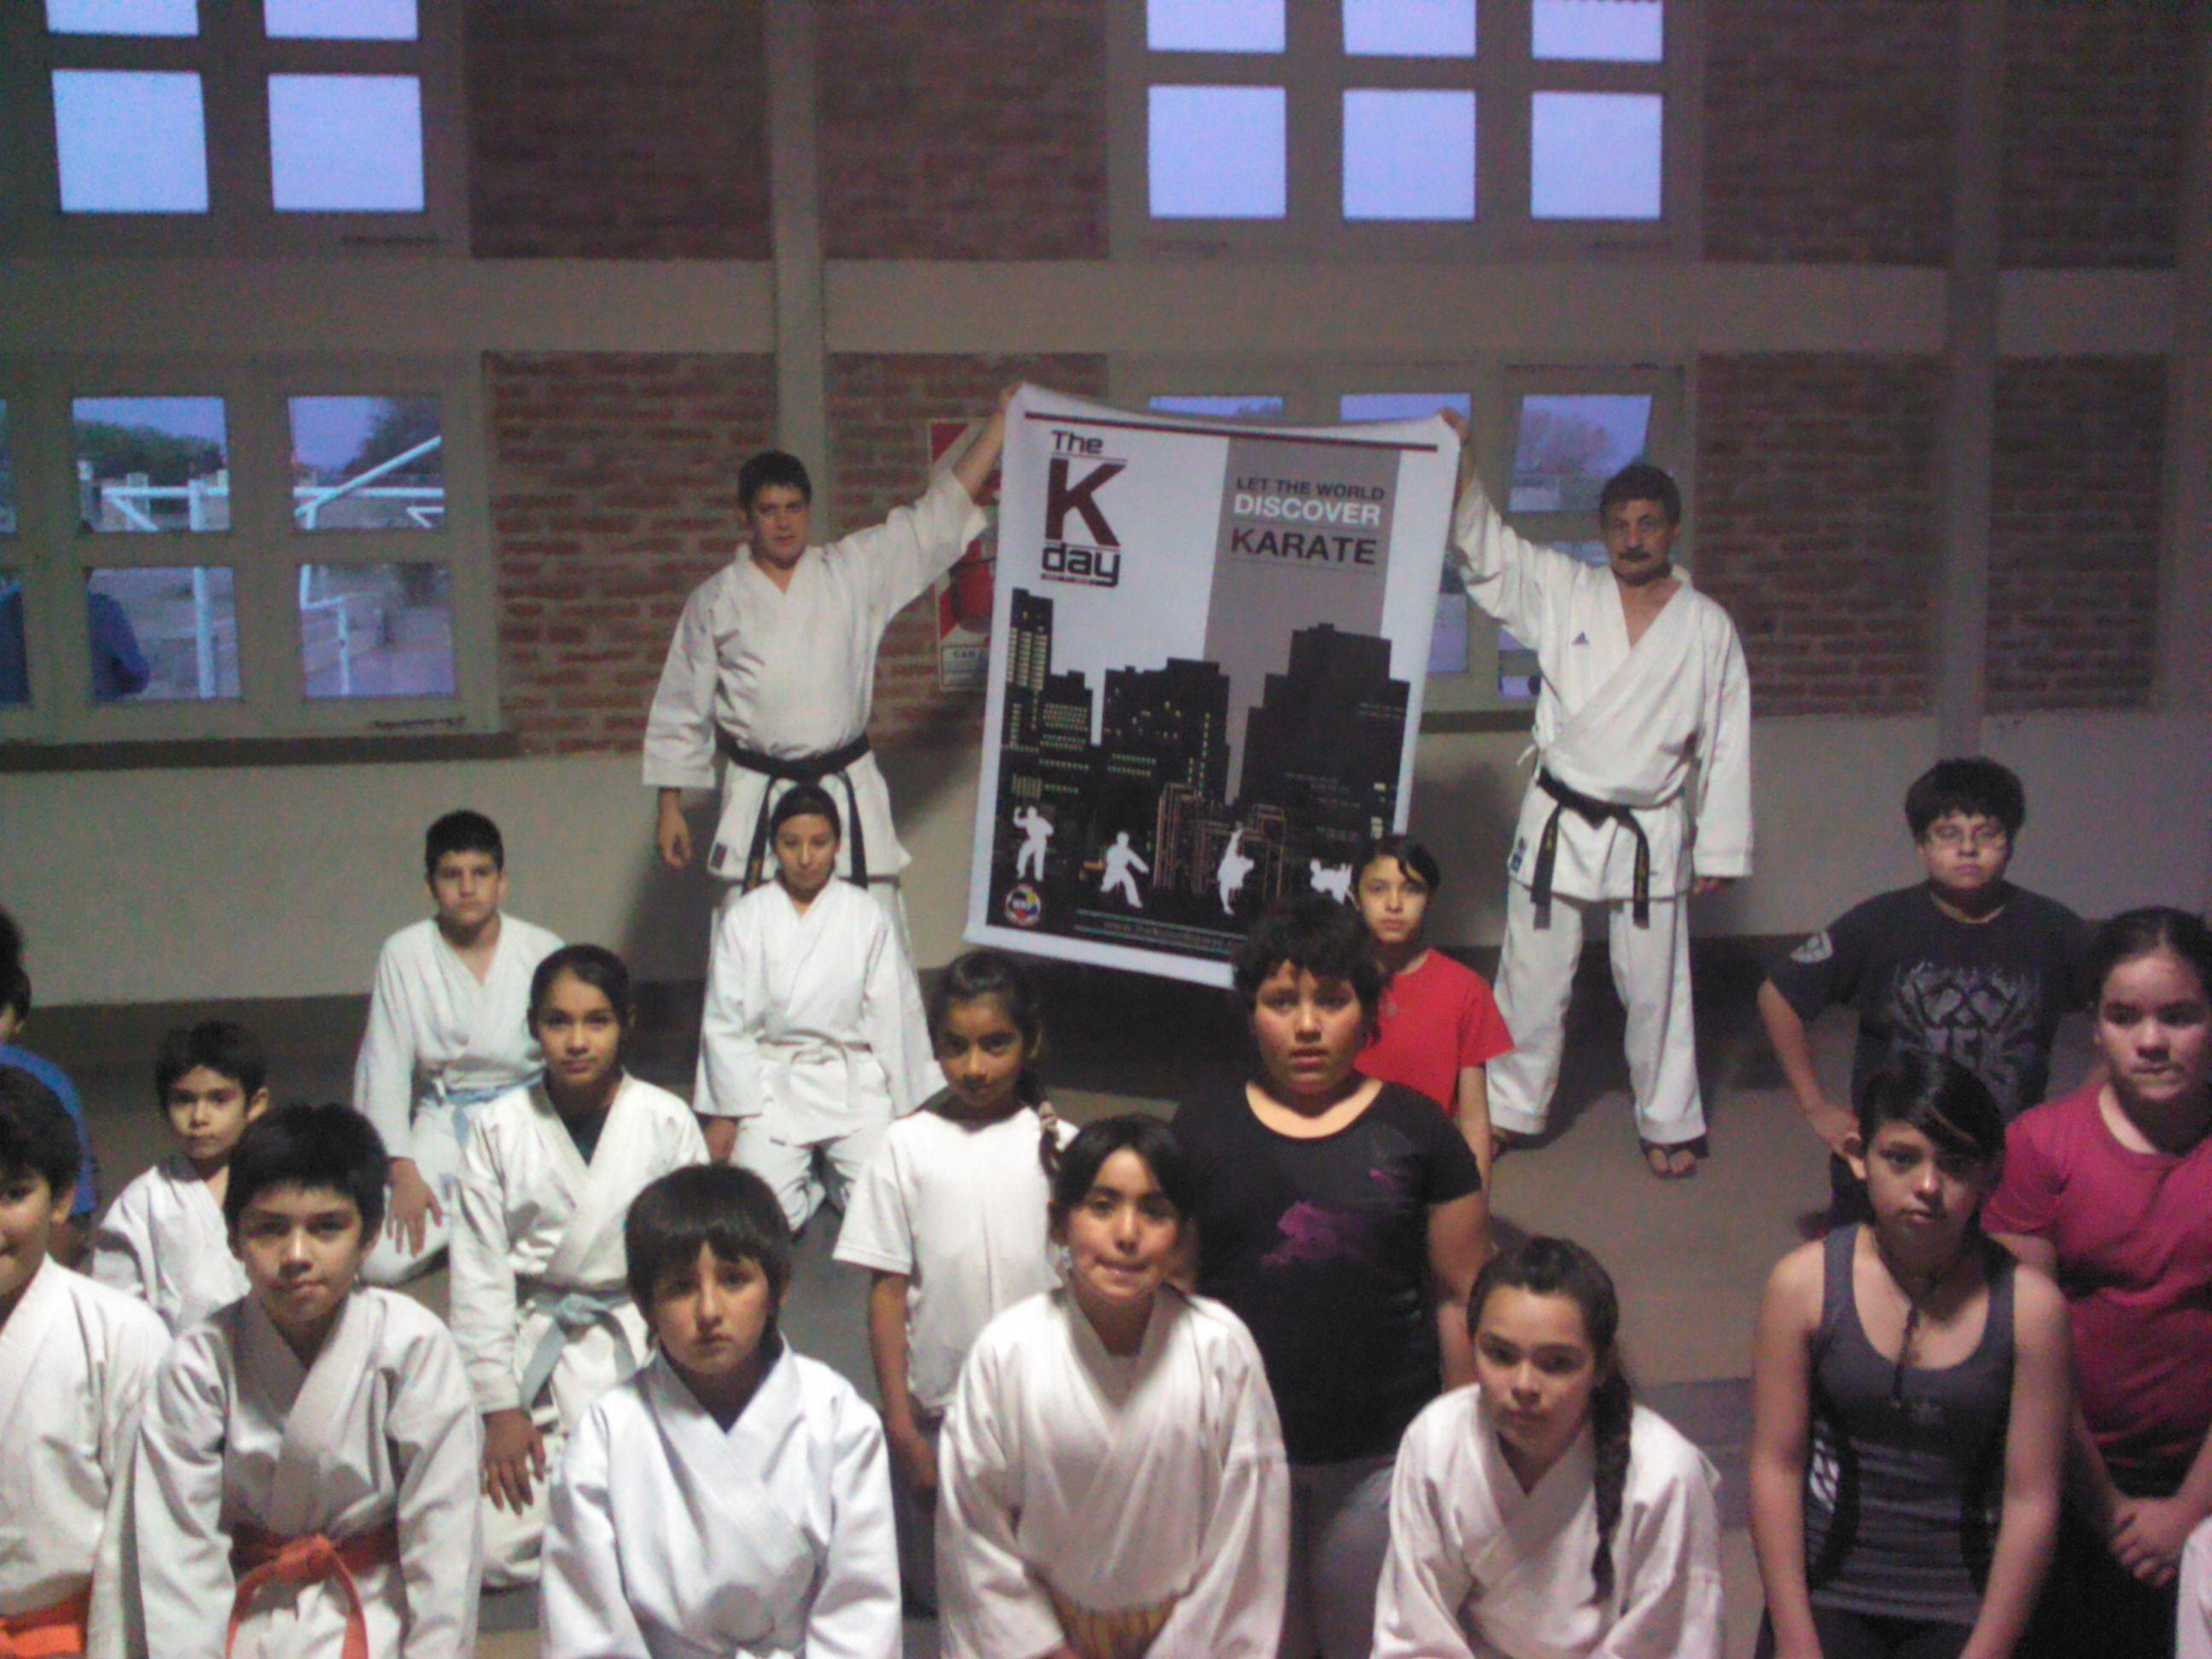 K Day, Catamarca, Argentina 6